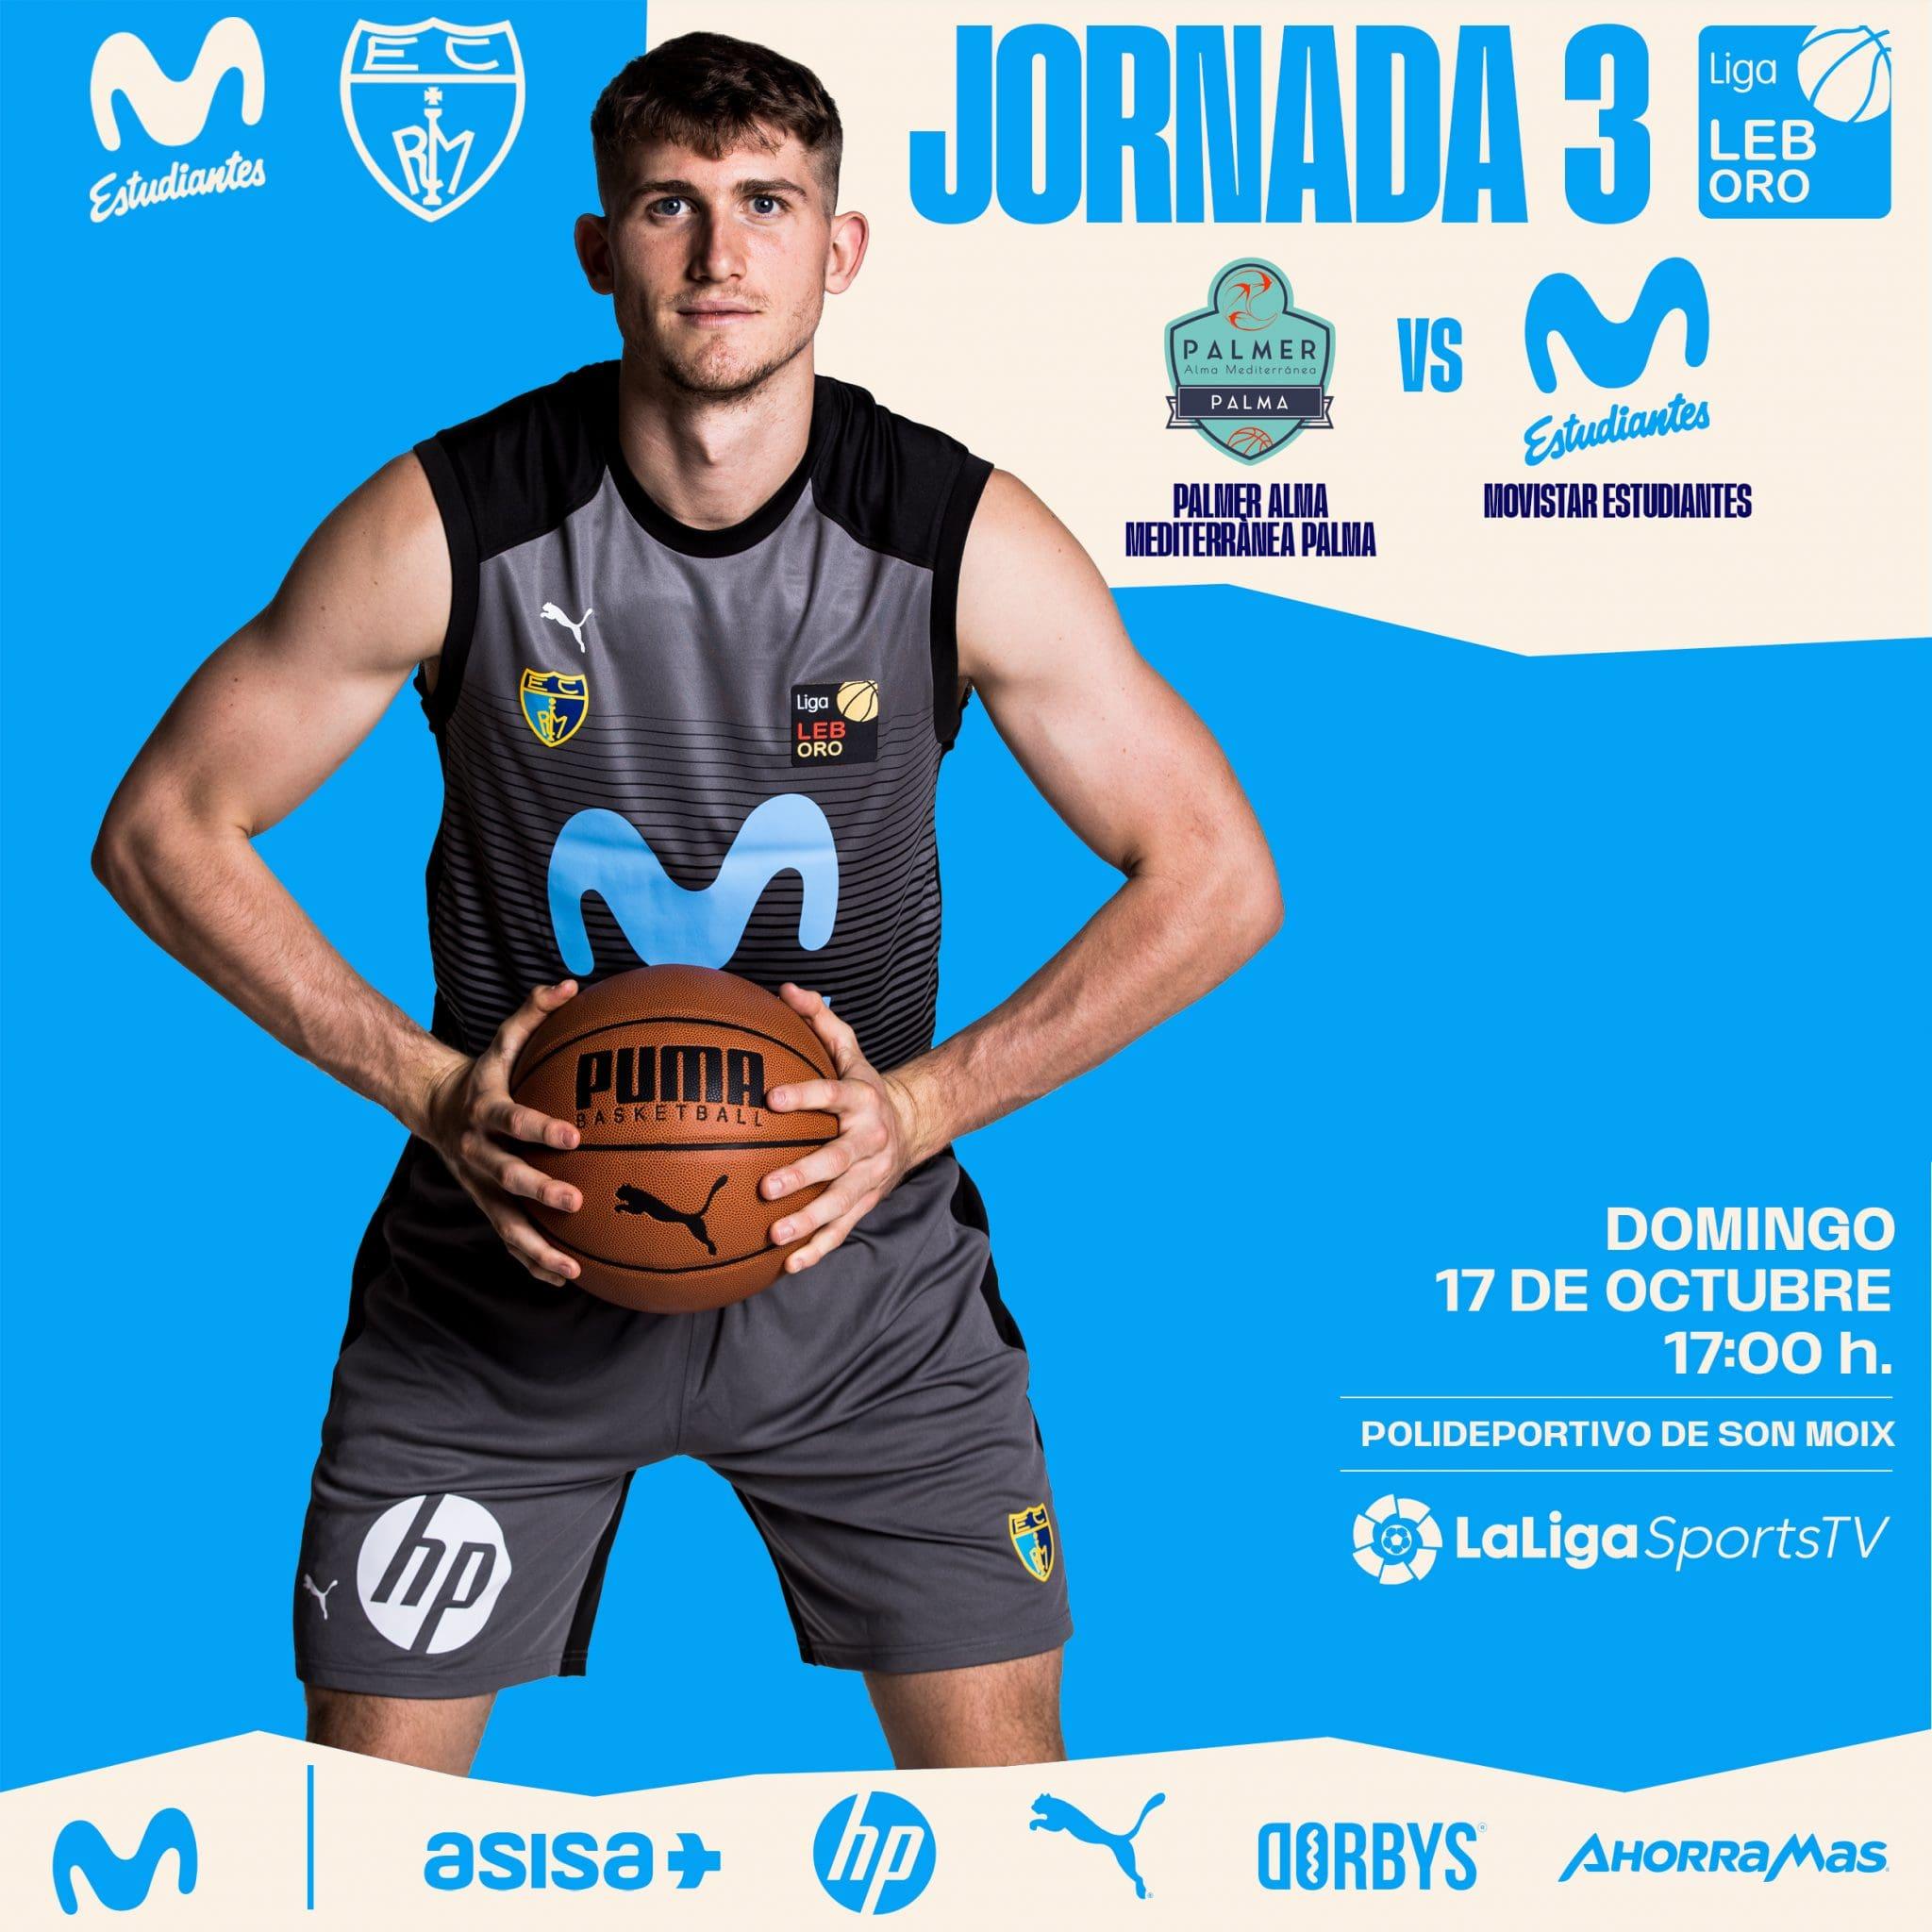 LEB: A Mallorca en busca de la tercera (domingo, 17h, LaLigaSportsTV)